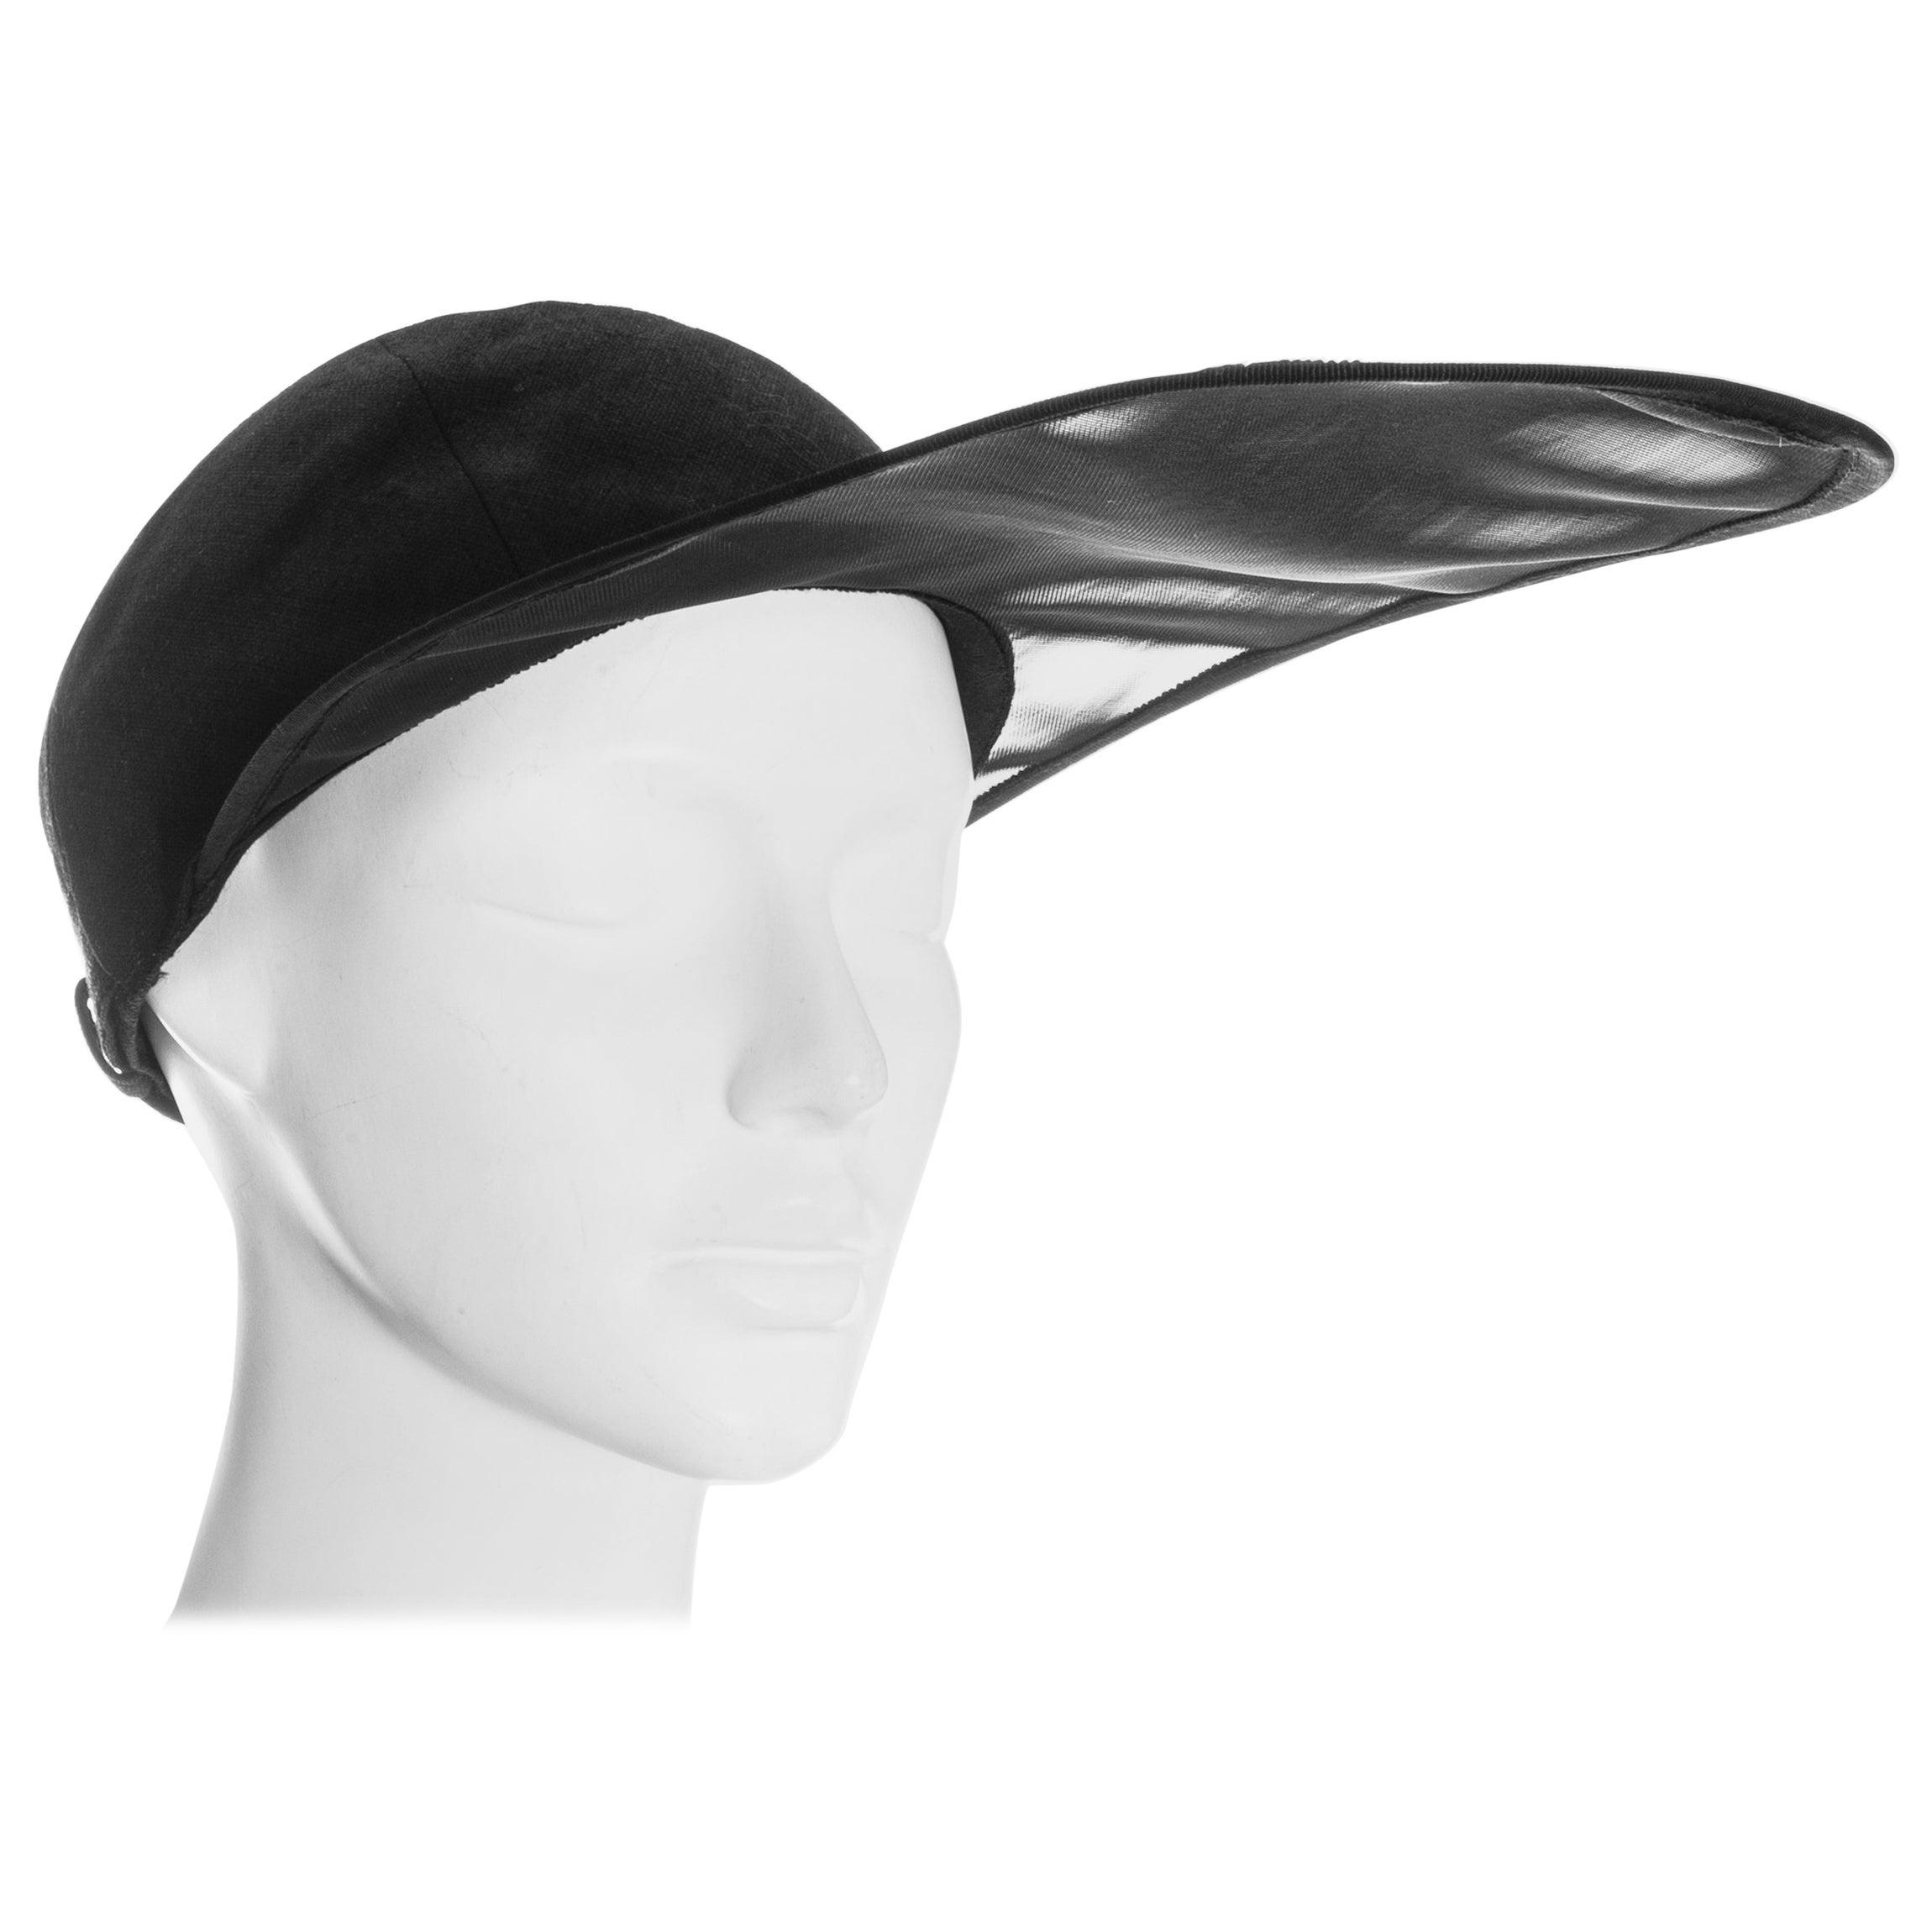 Yves Saint Laurent black linen cap with extra long organza visor, ss 1991